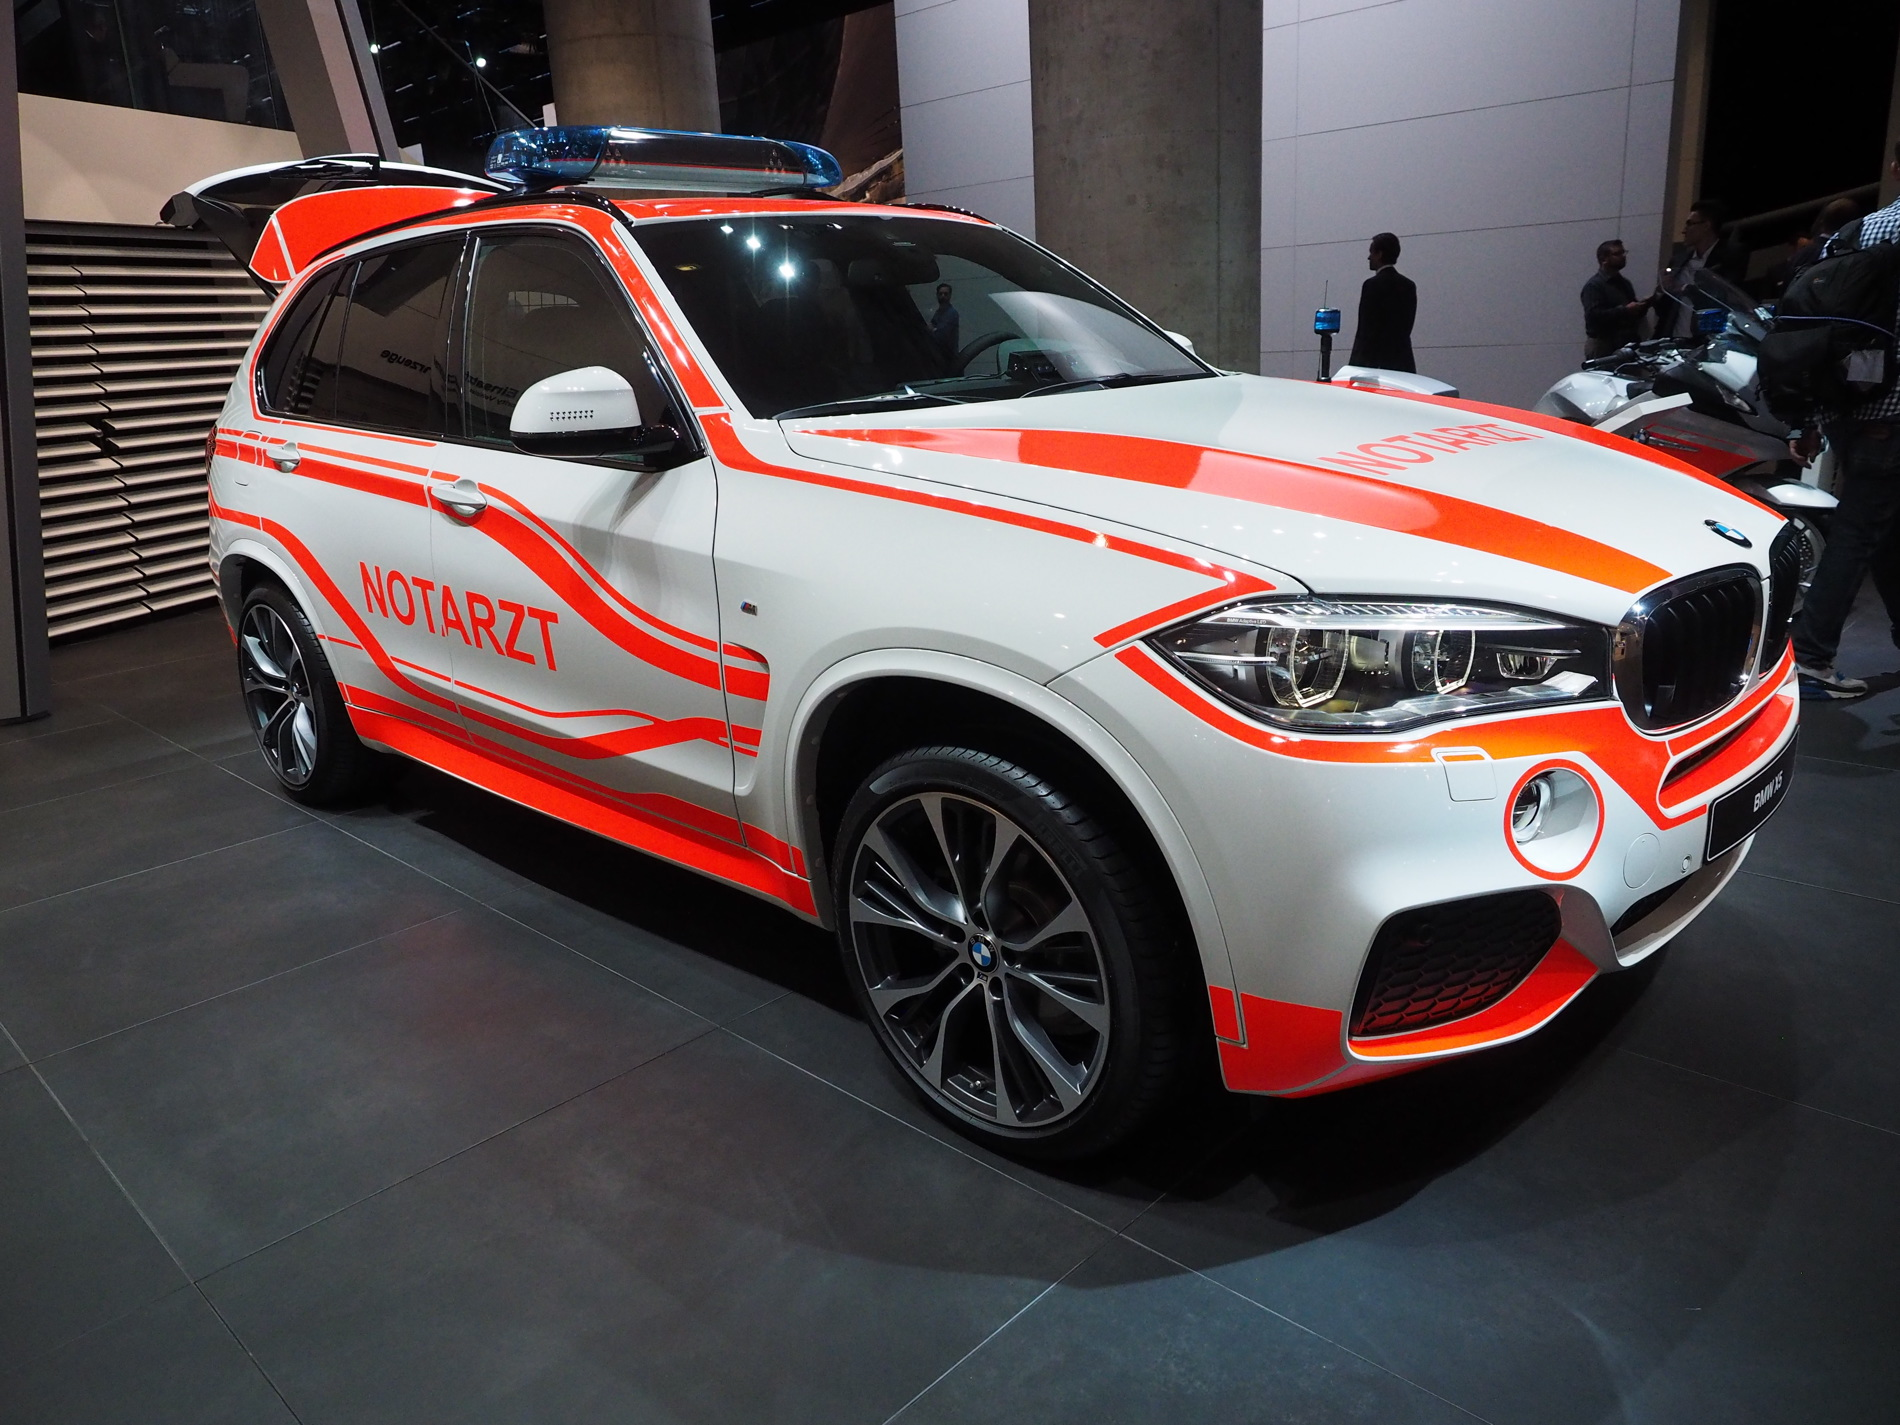 BMW X3 Emergency Vehicle images 03